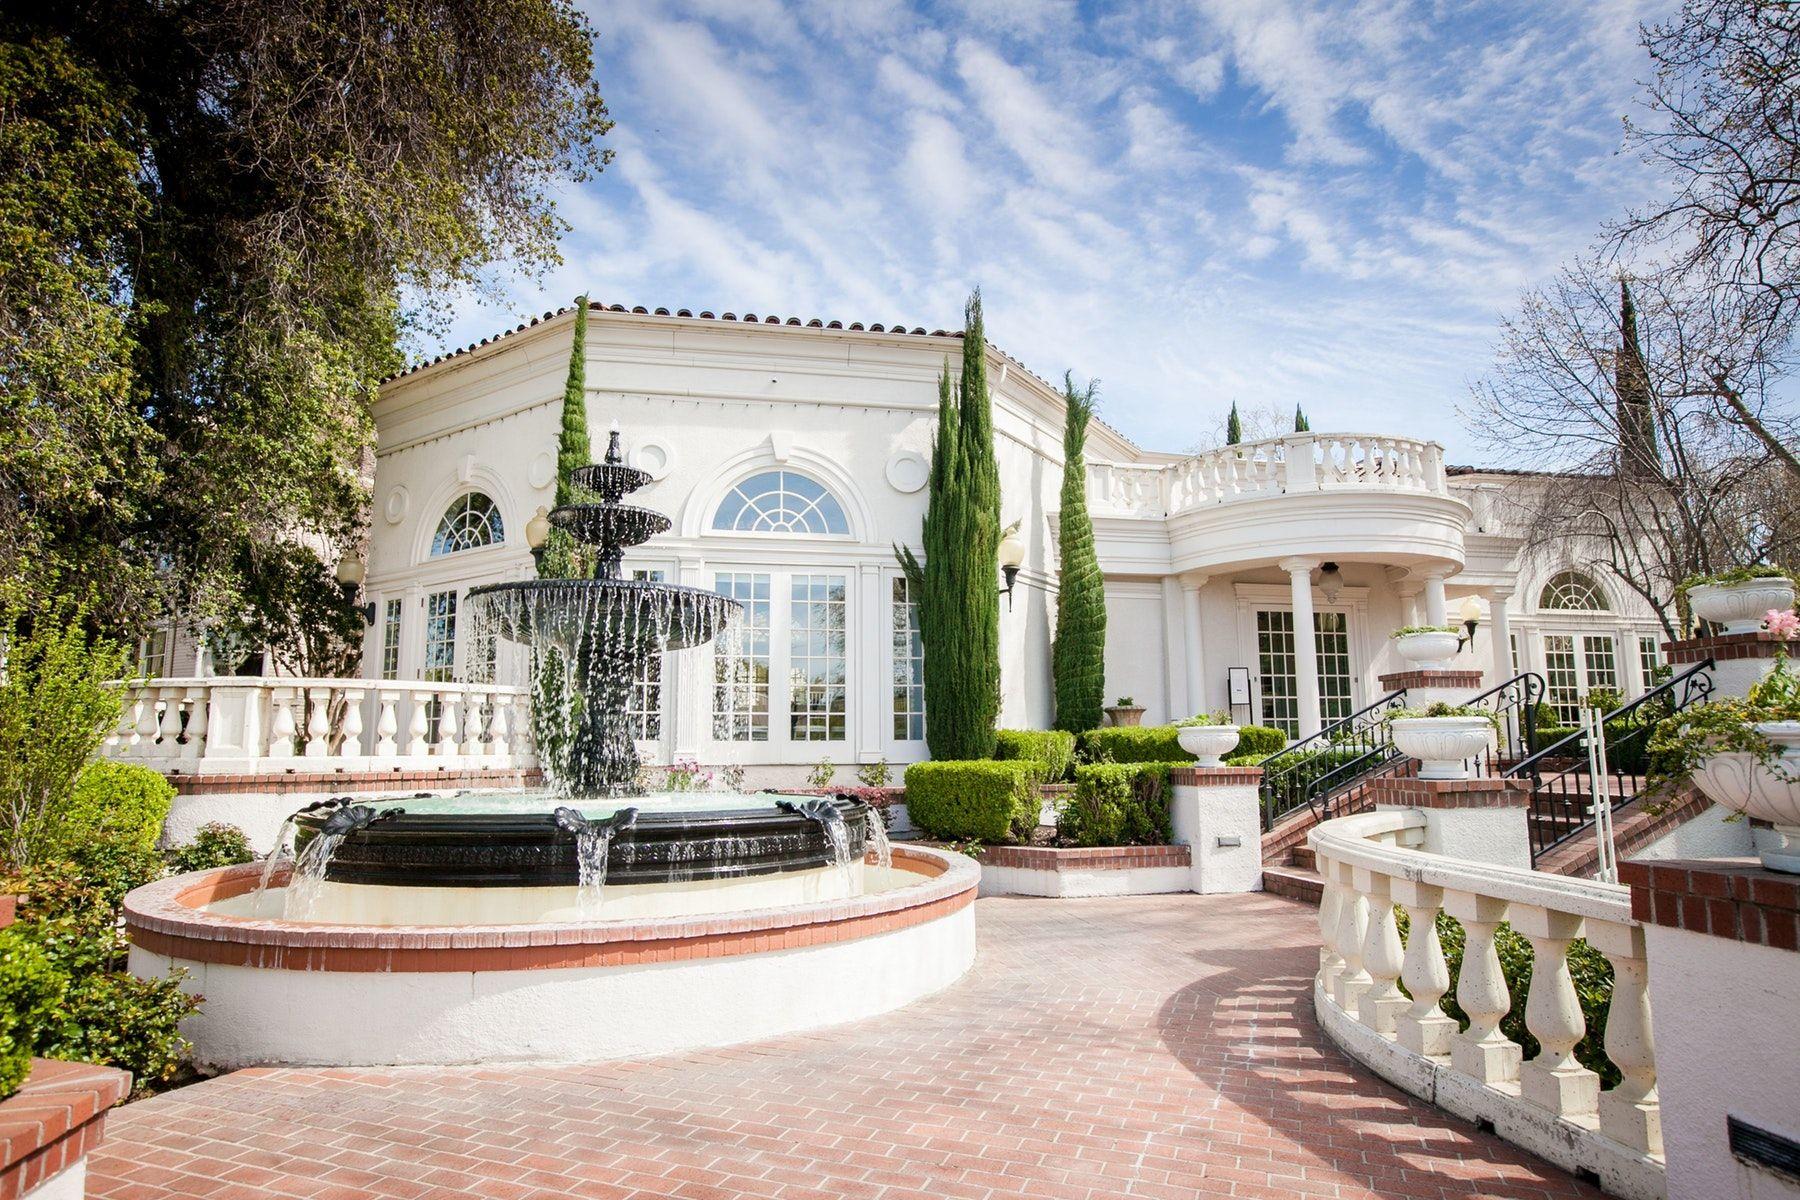 6 Wedding Venues In Downtown Sacramento California See Prices In 2020 Wedding Venues Sacramento Northern California Wedding Venues Cheap Northern California Wedding Venues